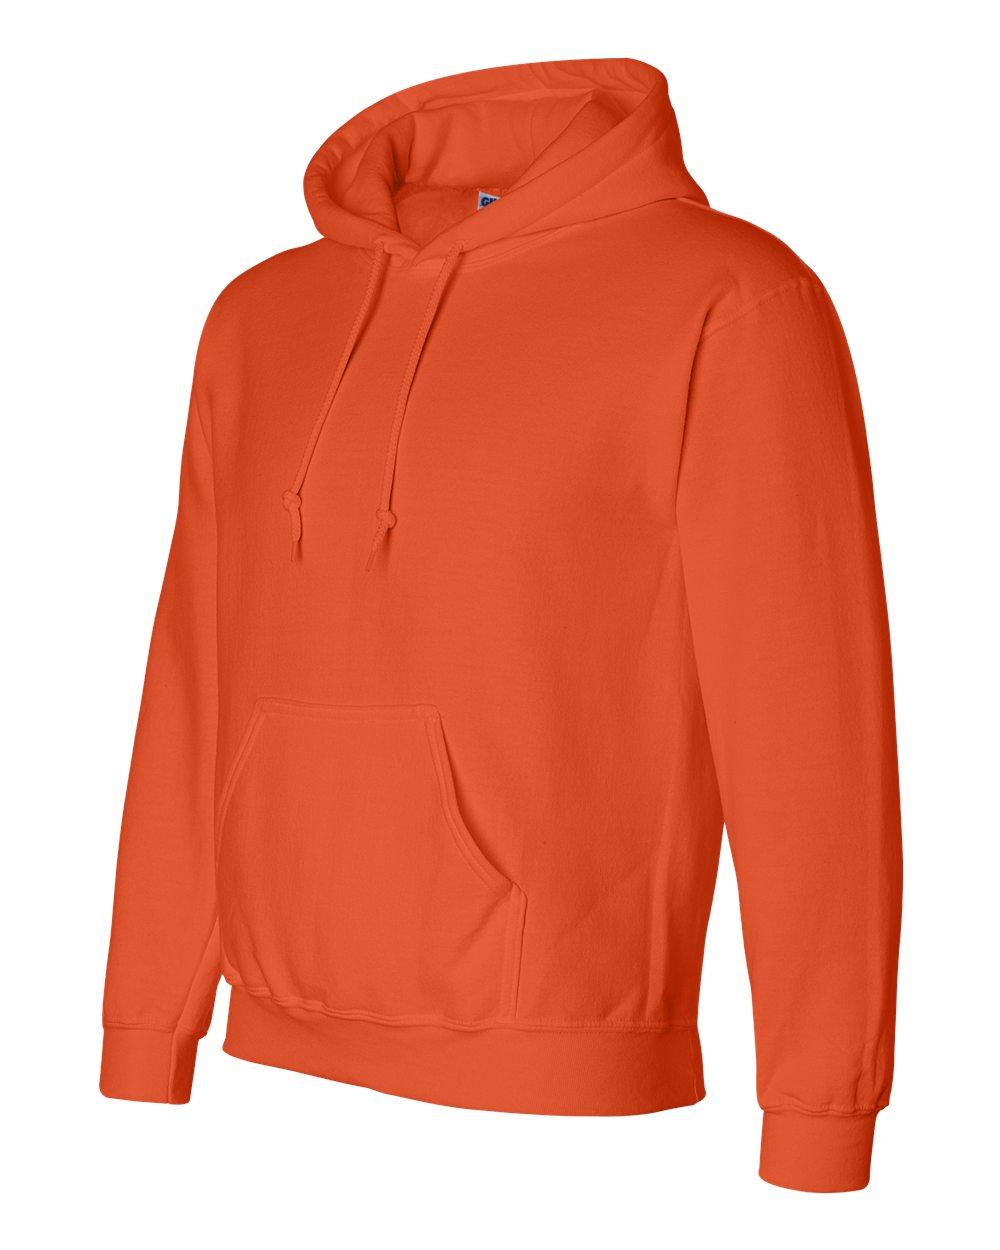 GIL12500 Orange